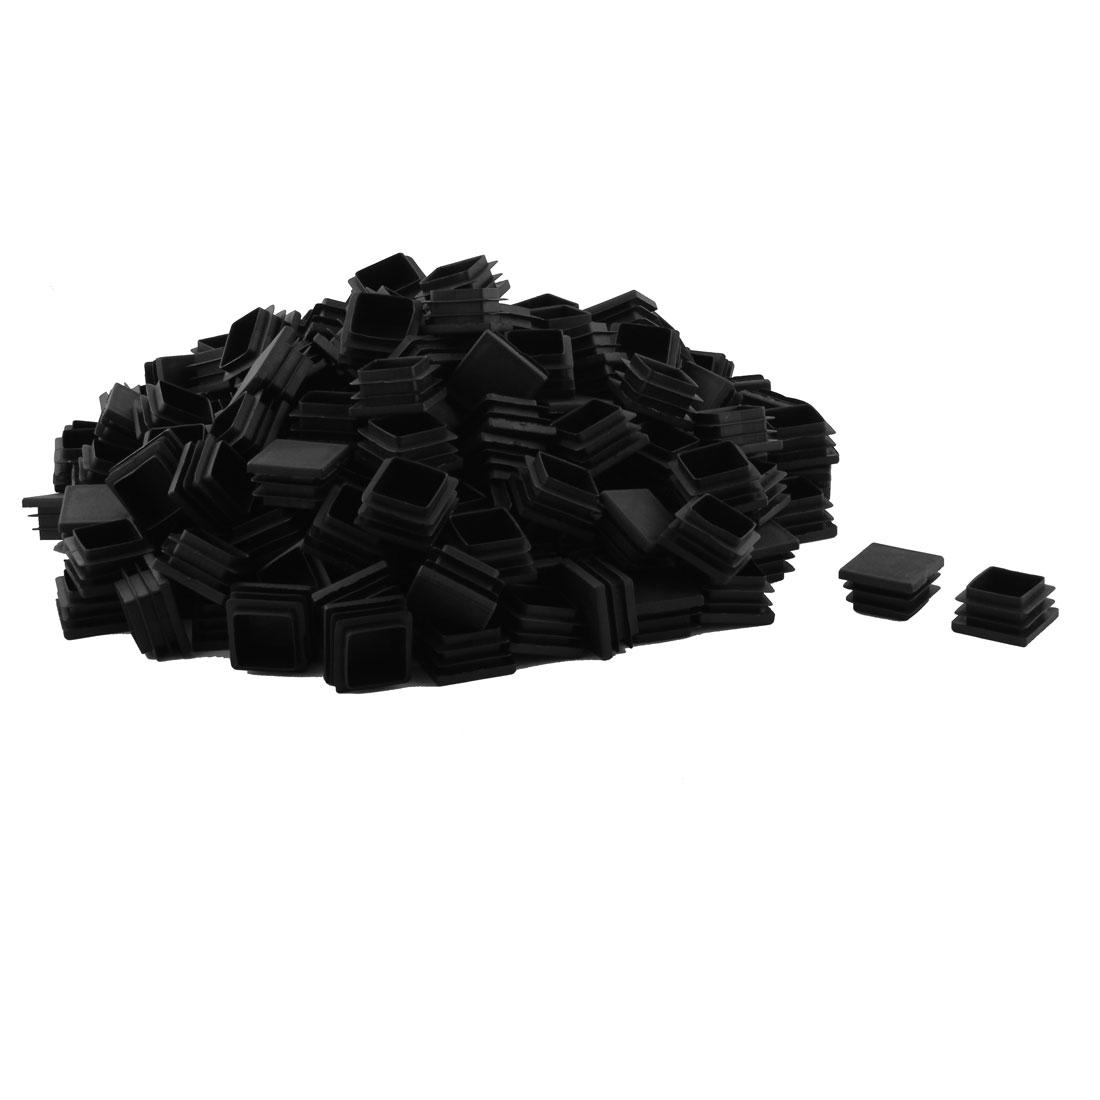 Plastic Square Design Tube Insert End Blanking Cover Cap Black 32 x 32mm 200pcs